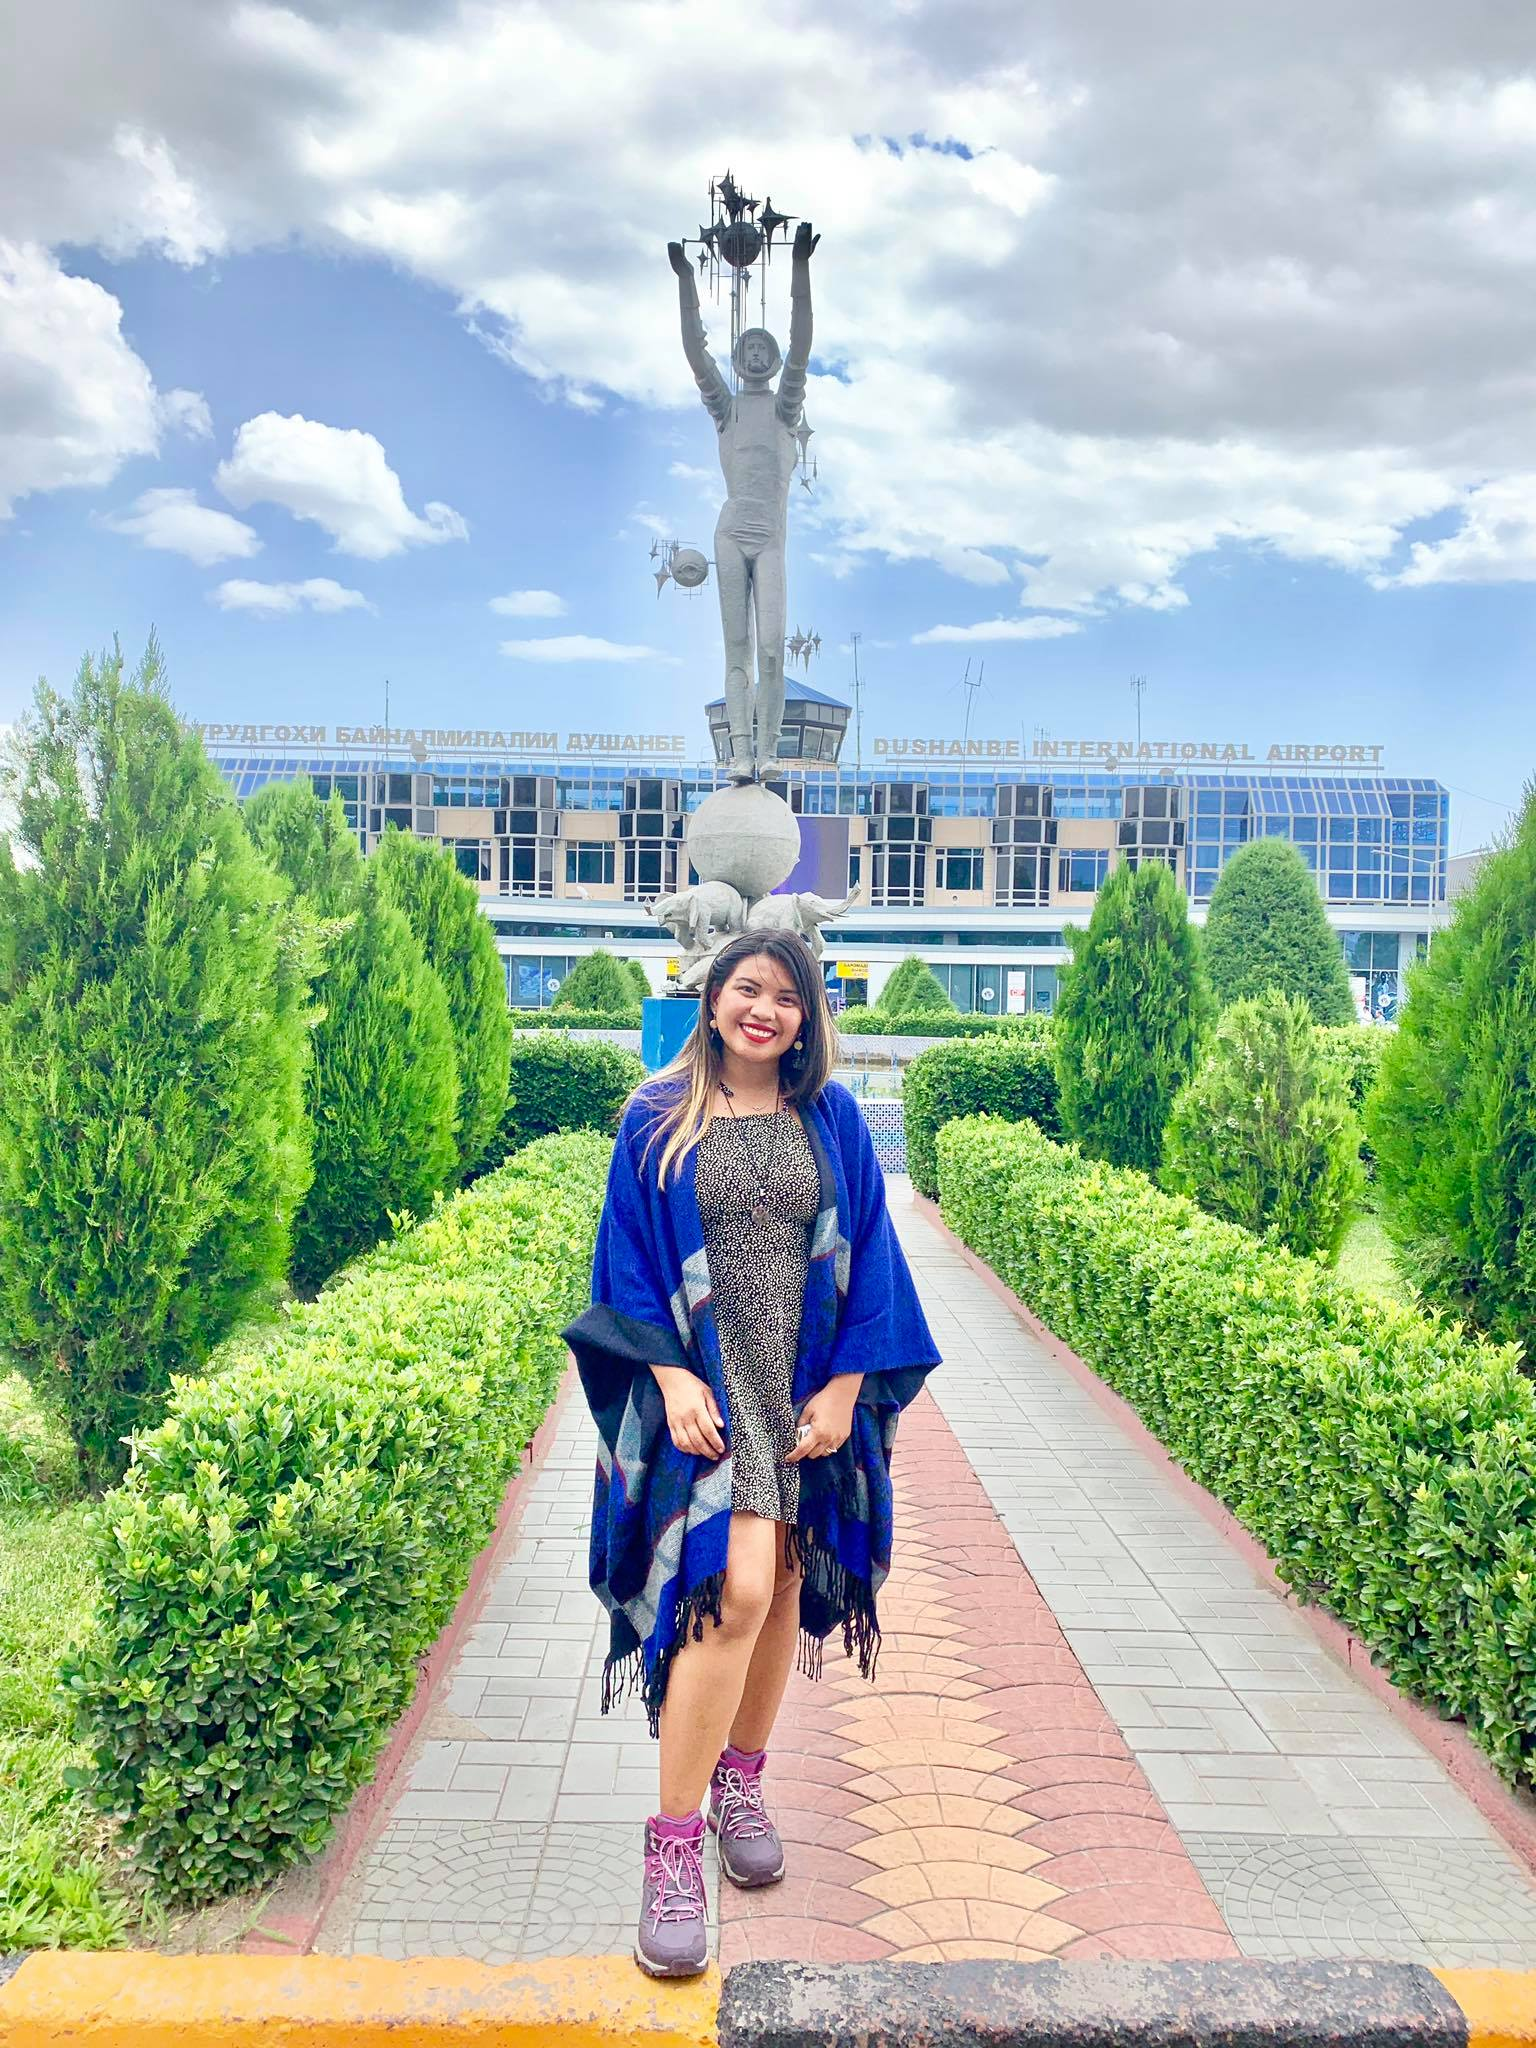 Kach Solo Travels in 2019 I just arrived in Dushanbe, Tajikistan15.jpg